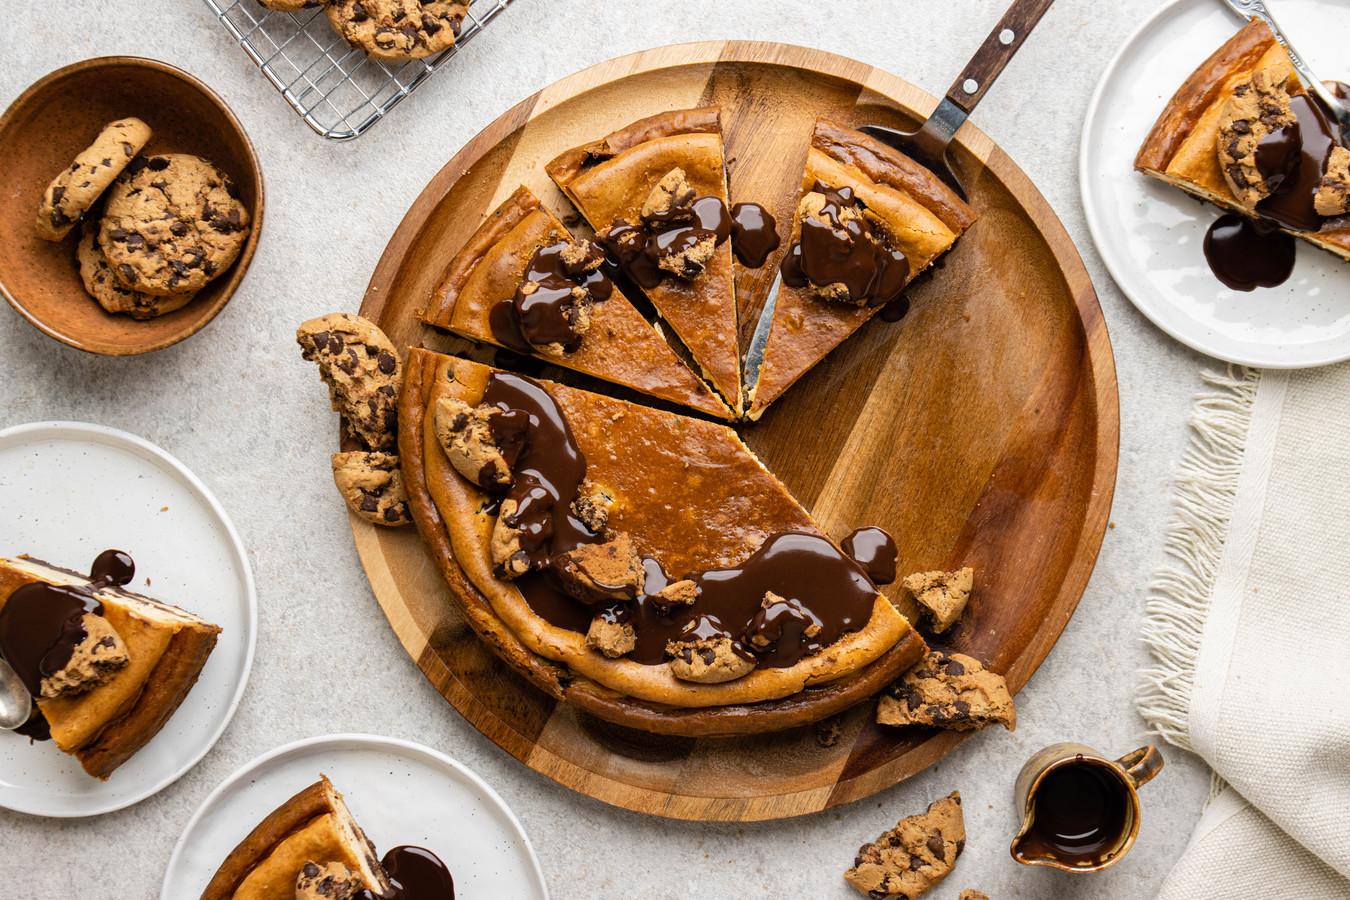 New York style cheesecake met chocolate chip cookies.